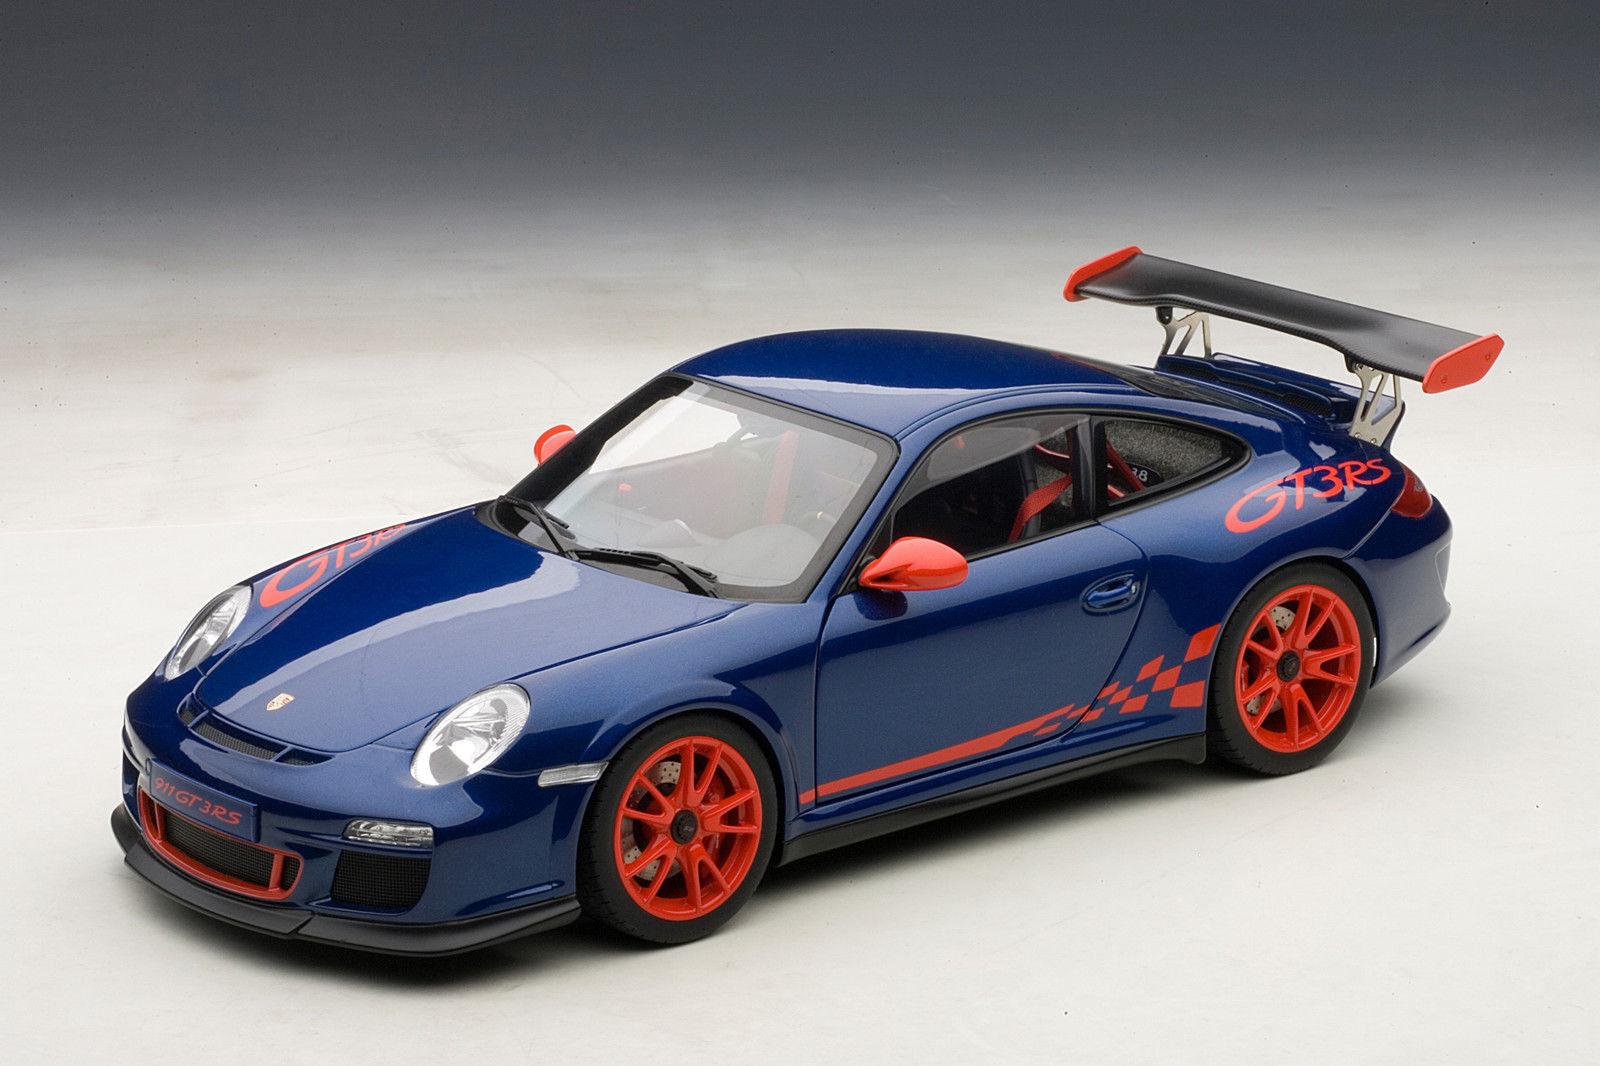 1/18 Autoart Porsche 911  997  gt3 RS 3.8  blu/rosso Stripes  2010